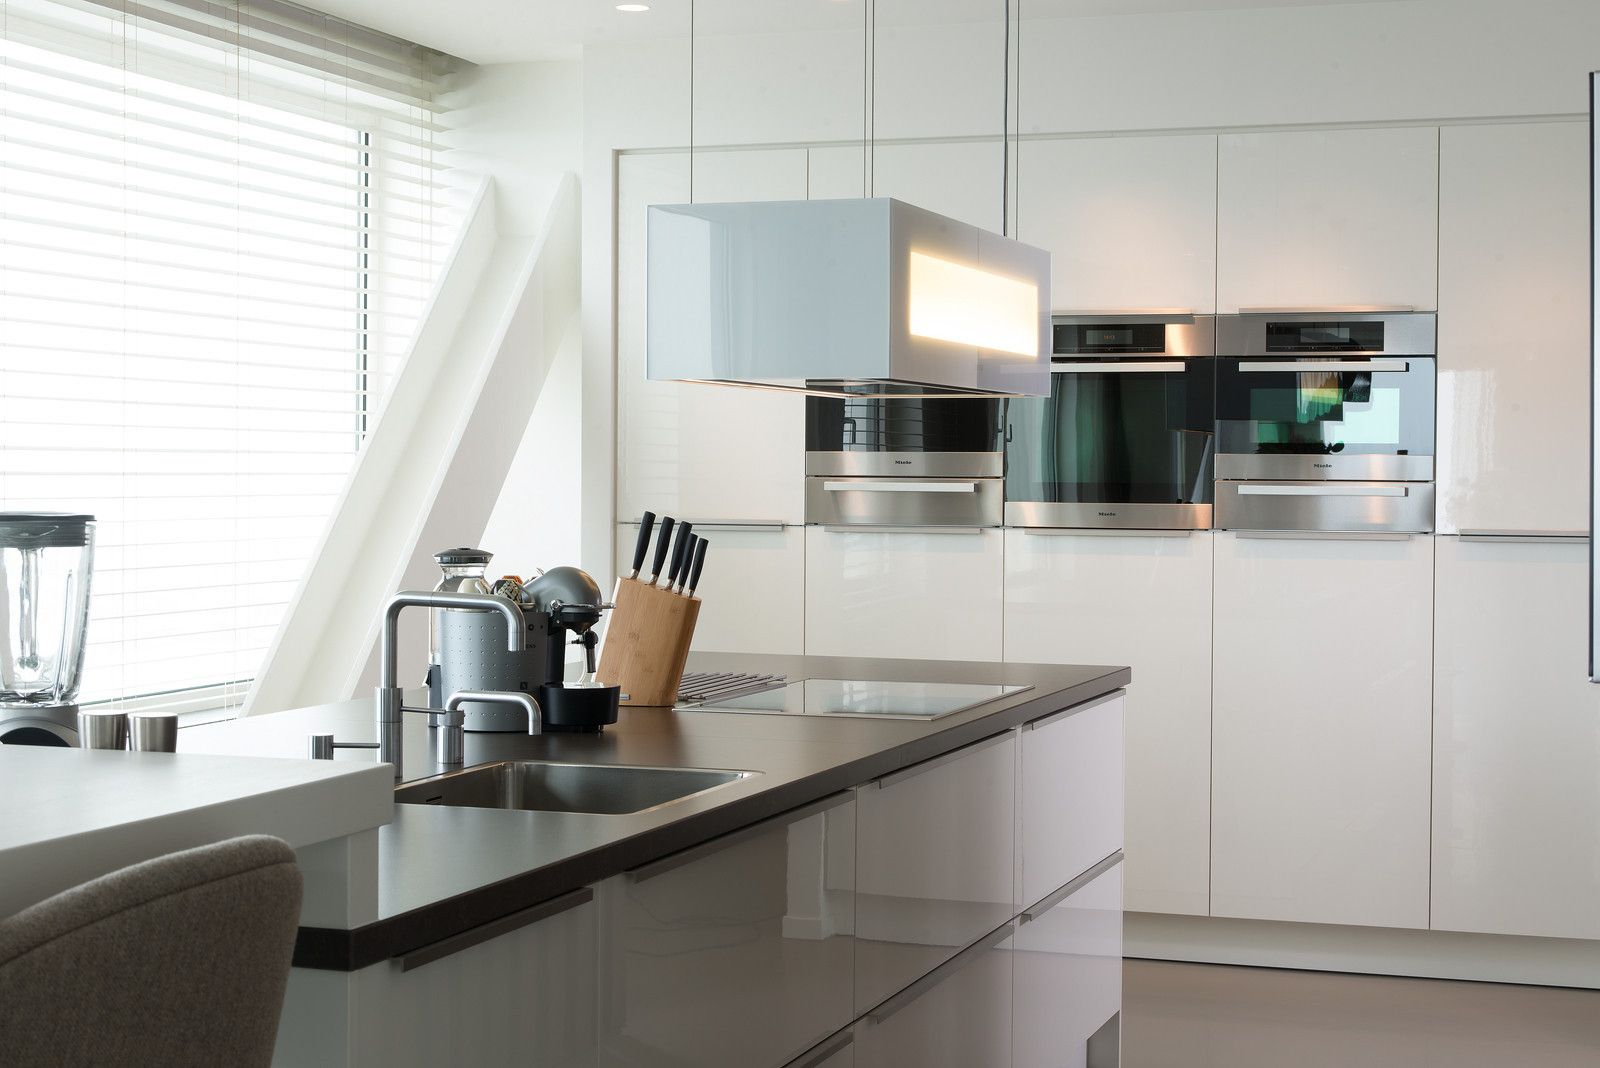 Keuken Moderne Bar : Deze moderne keuken heeft een geïntegreerde bar tafel een